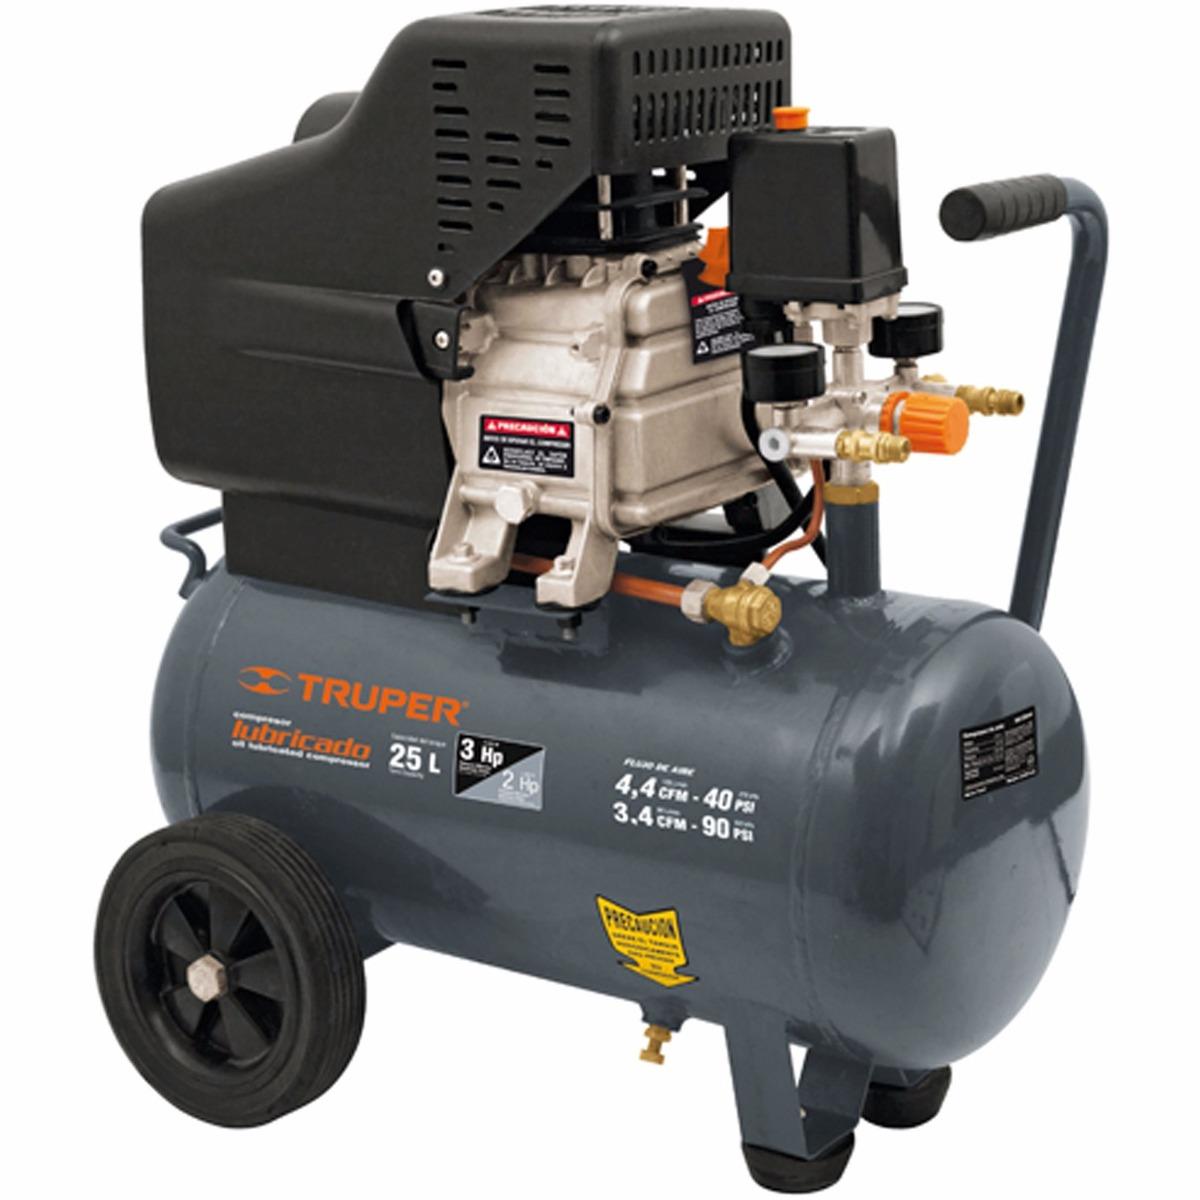 Compresor de aire lubricado 25 litros truper 19010 - Precio de compresores de aire ...